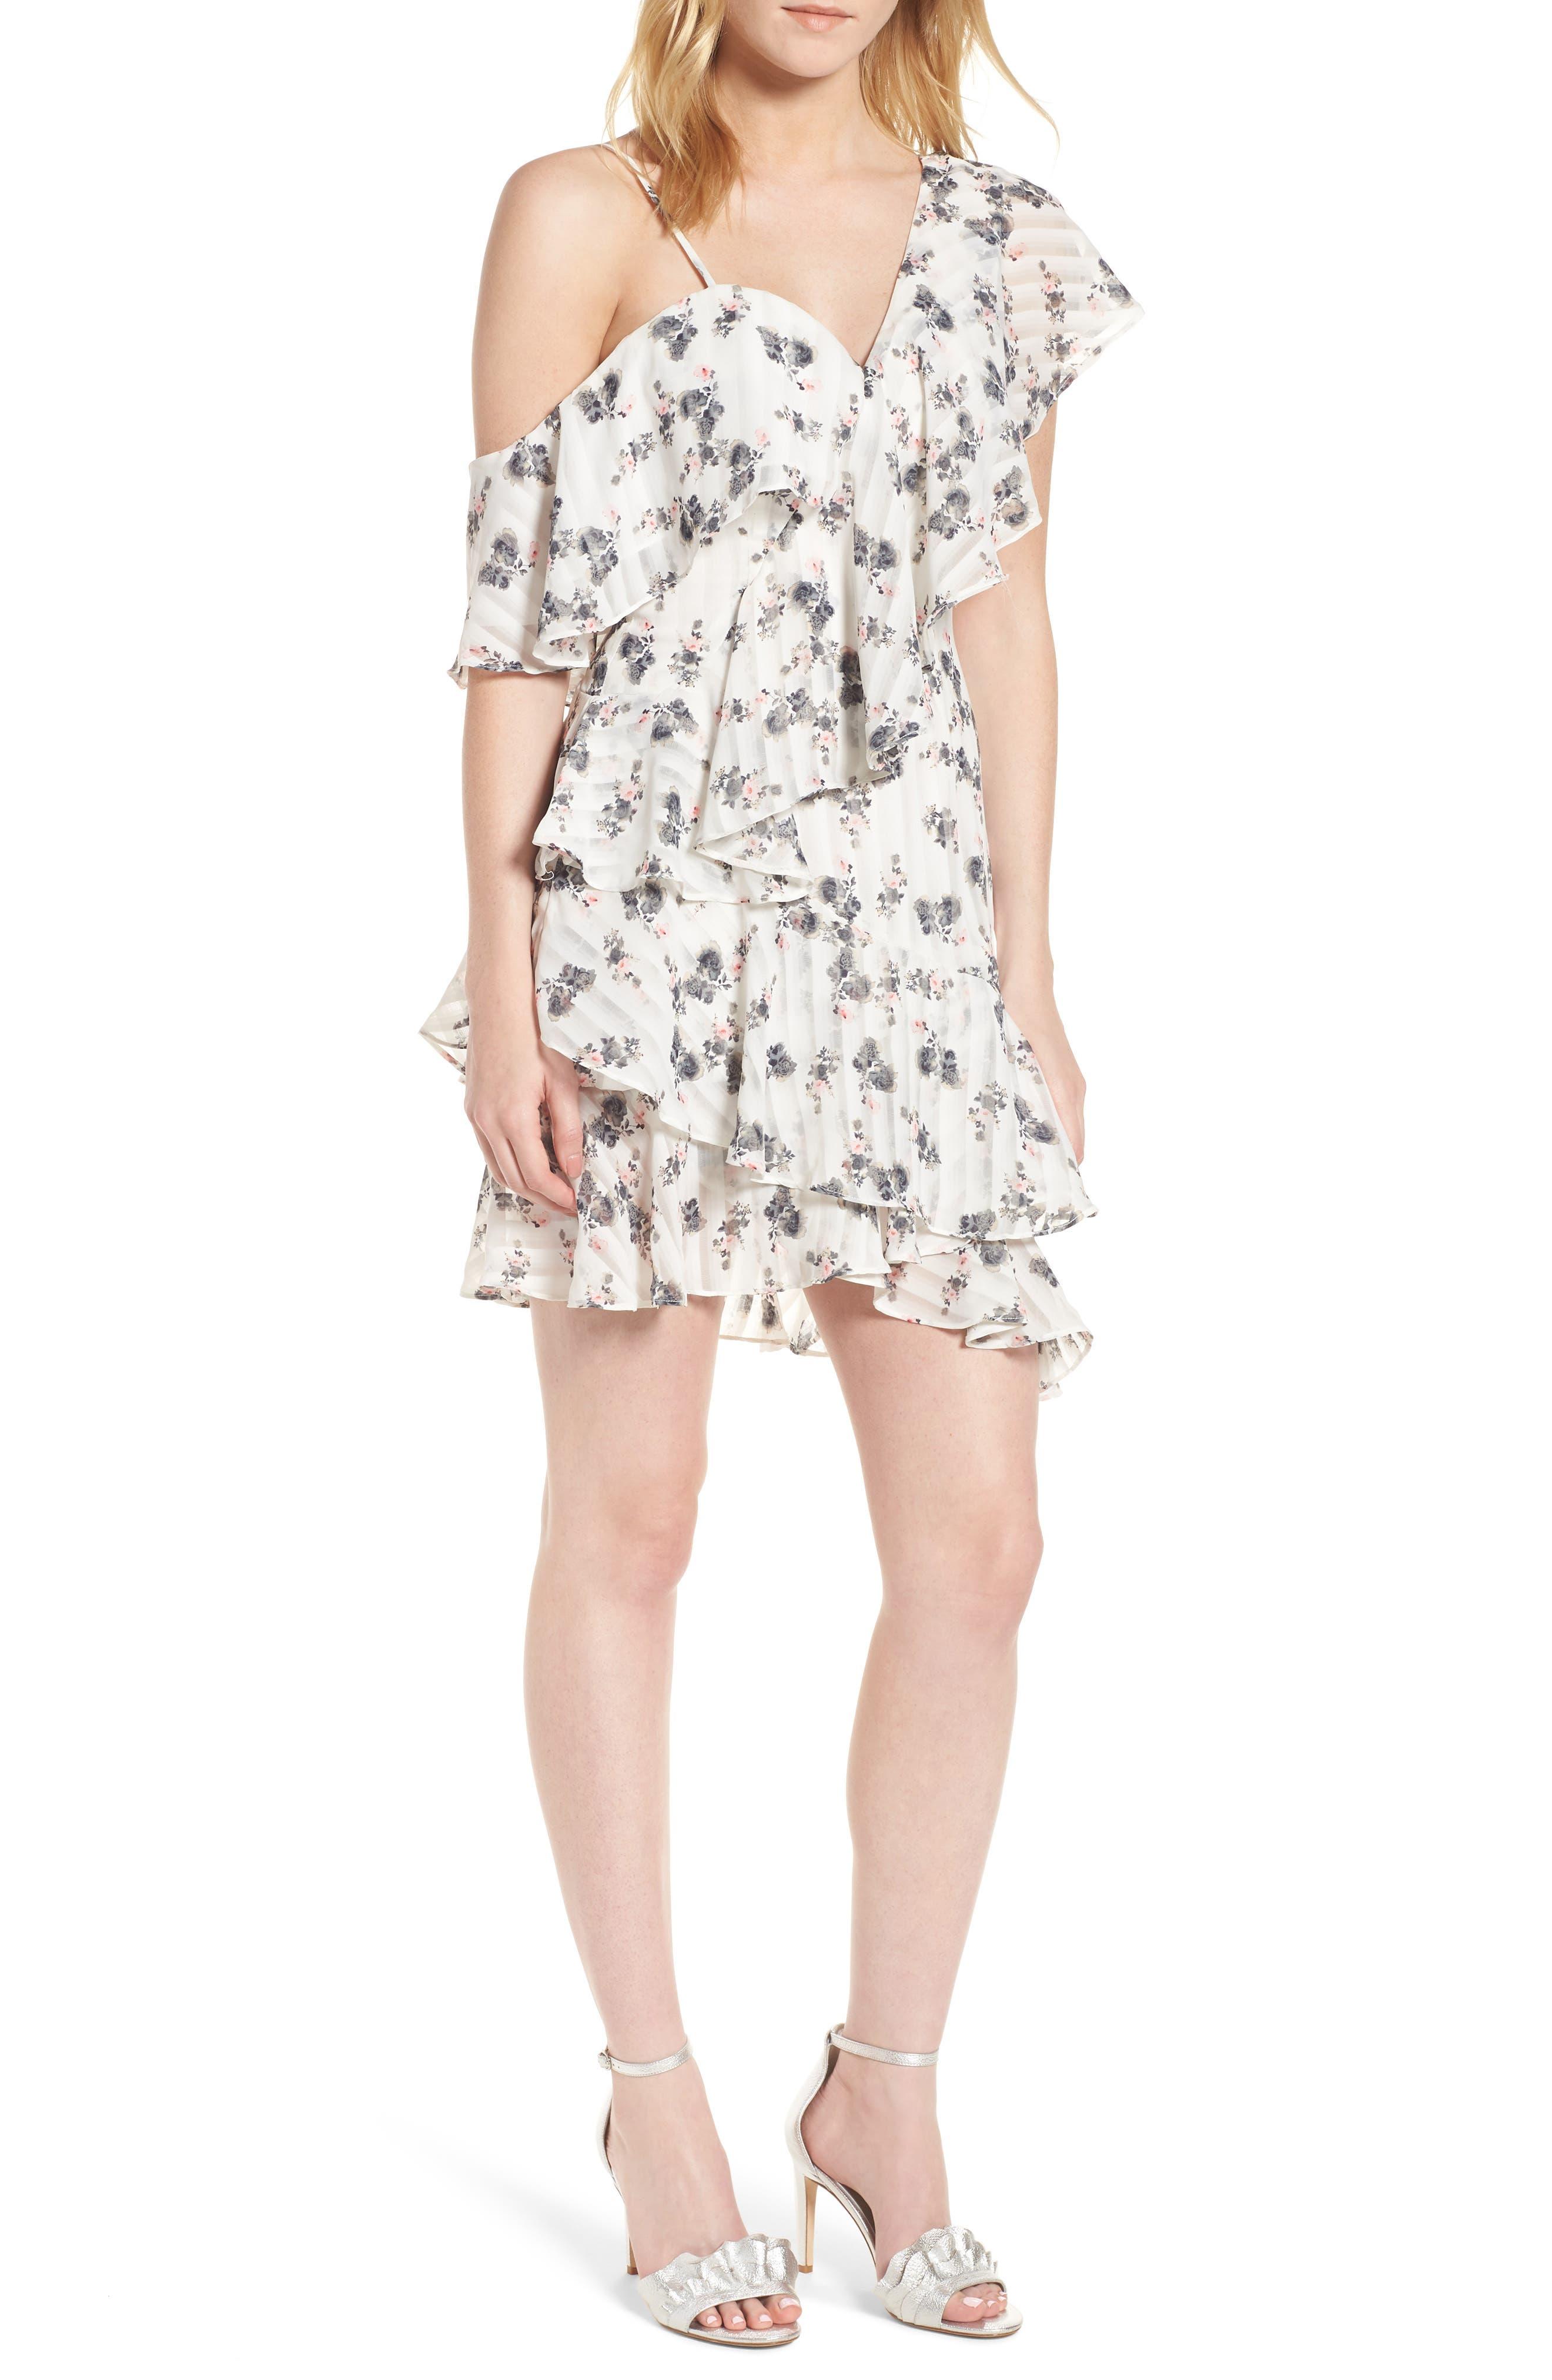 Bloom One-Shoulder Dress,                             Main thumbnail 1, color,                             100